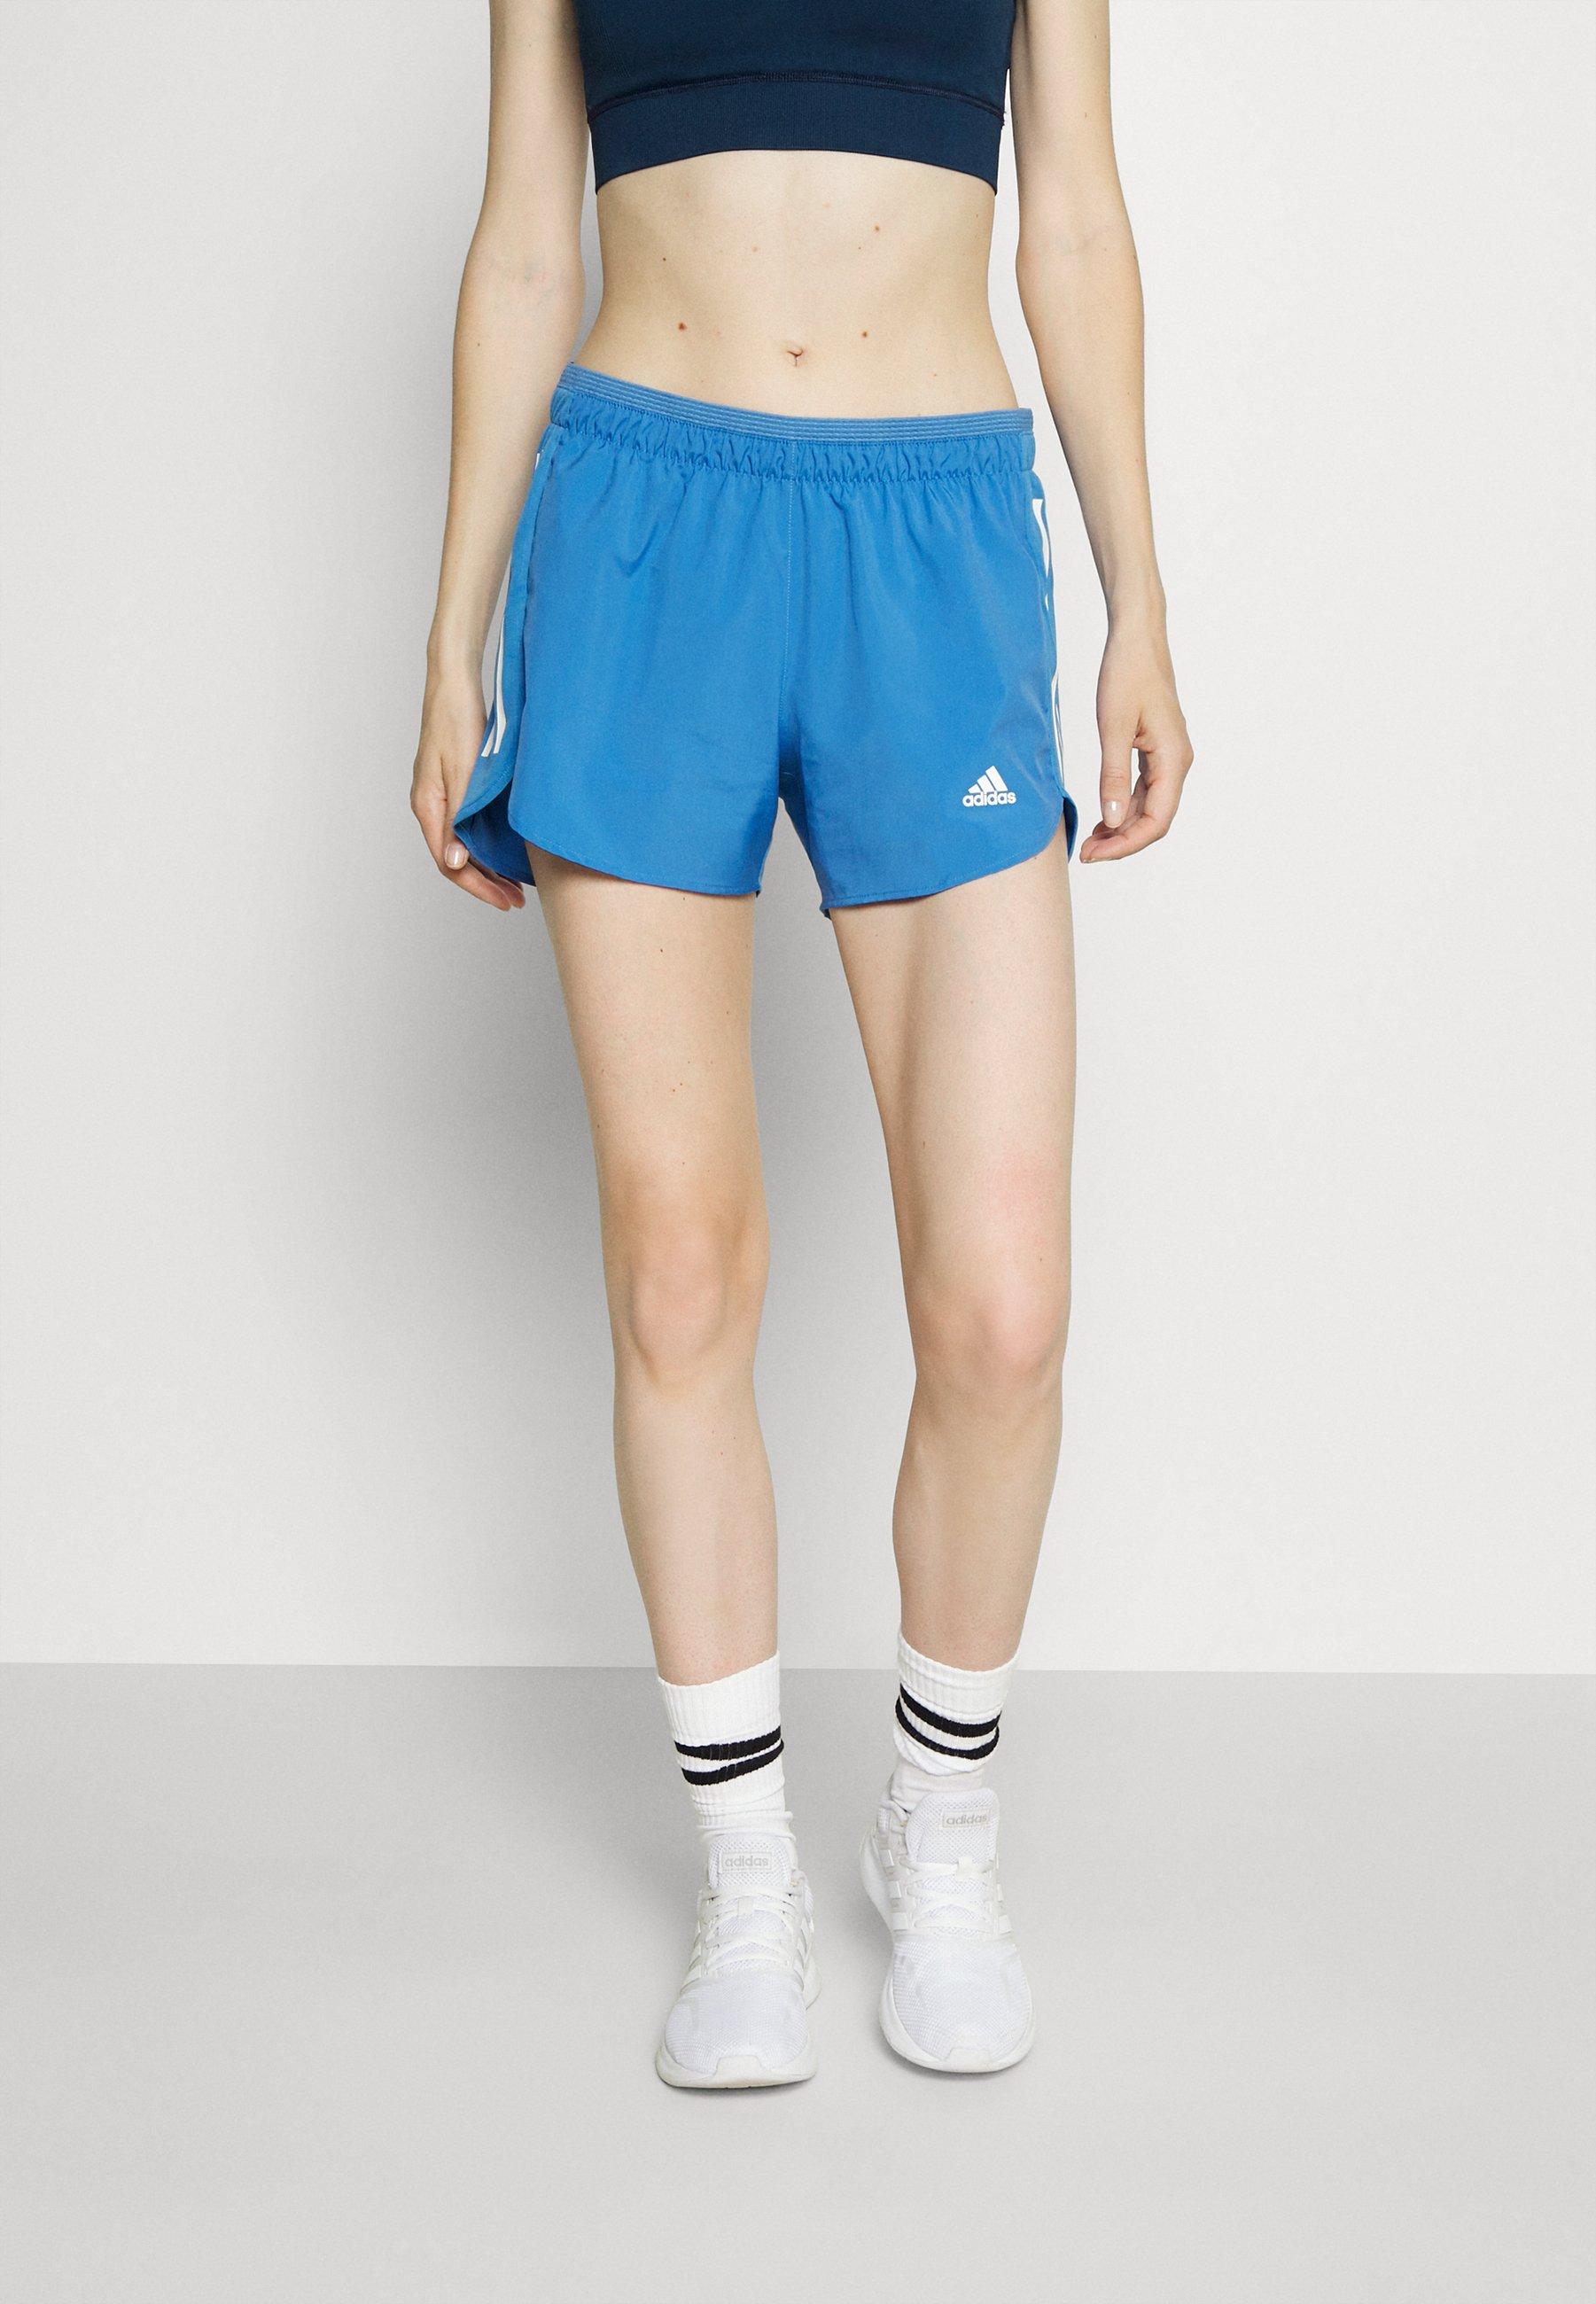 Damen RUN IT SHORT - kurze Sporthose